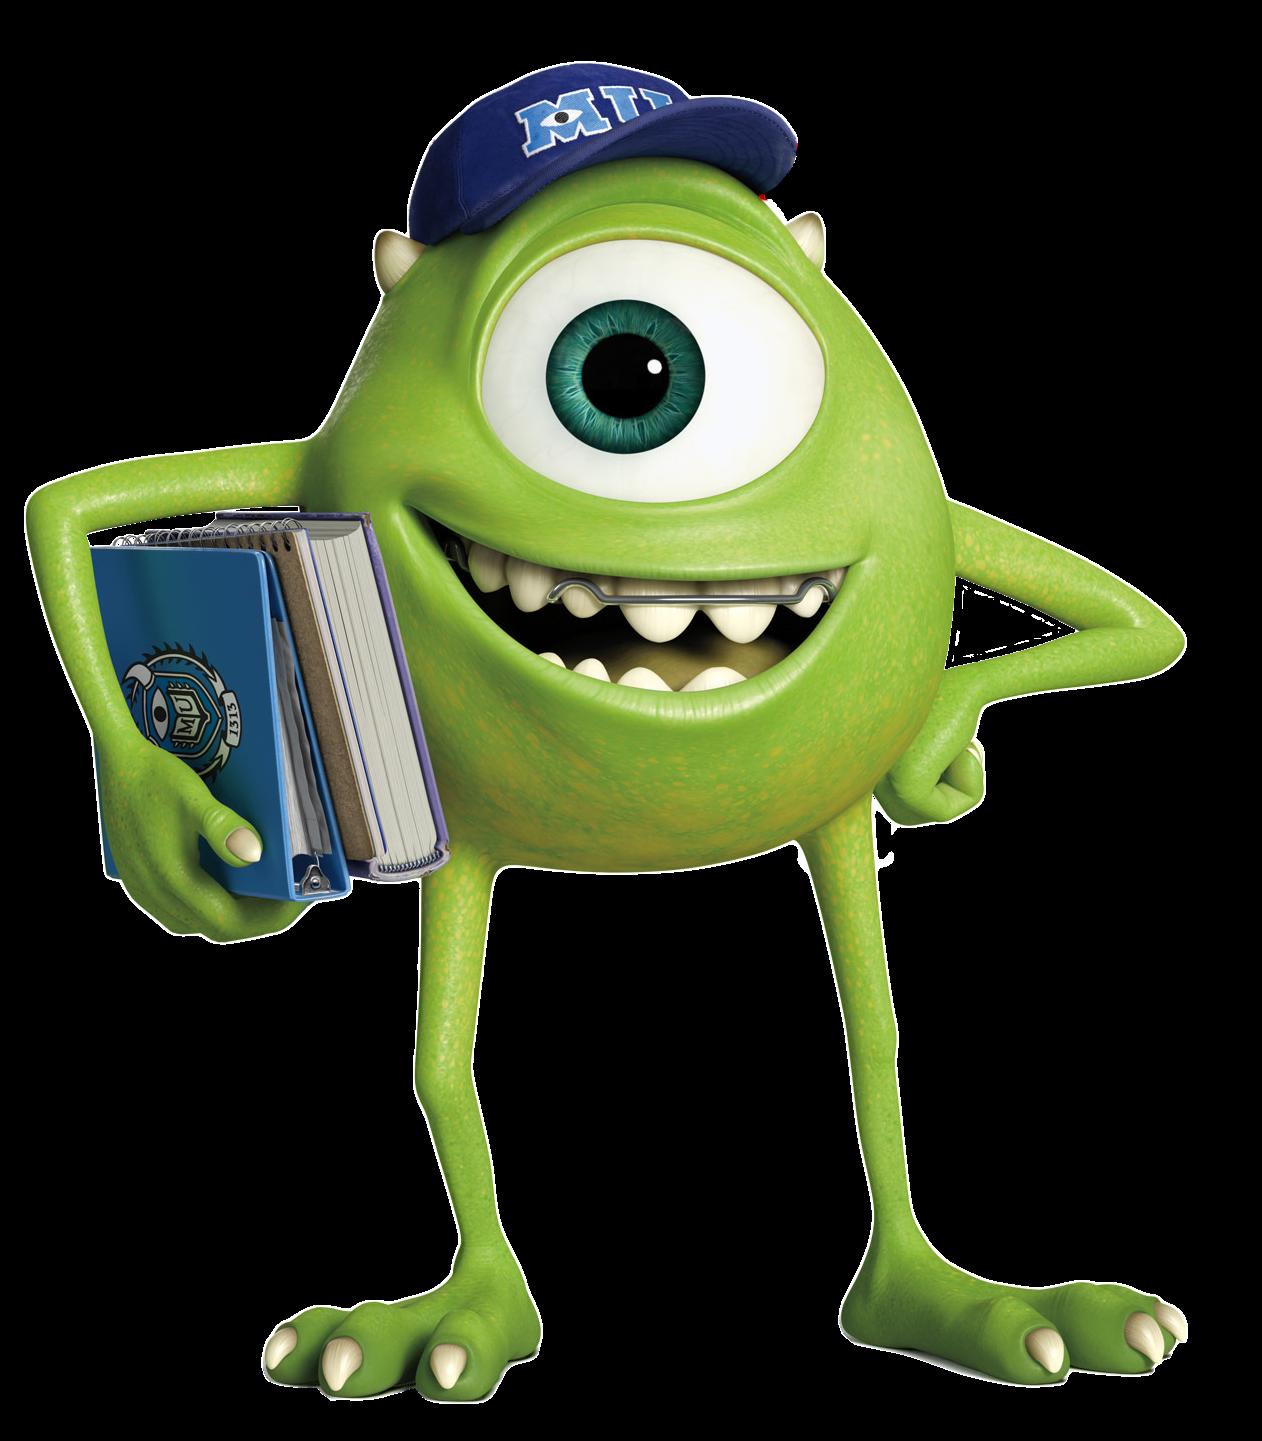 Cartoon Characters Monsters : Cartoon characters monsters inc png